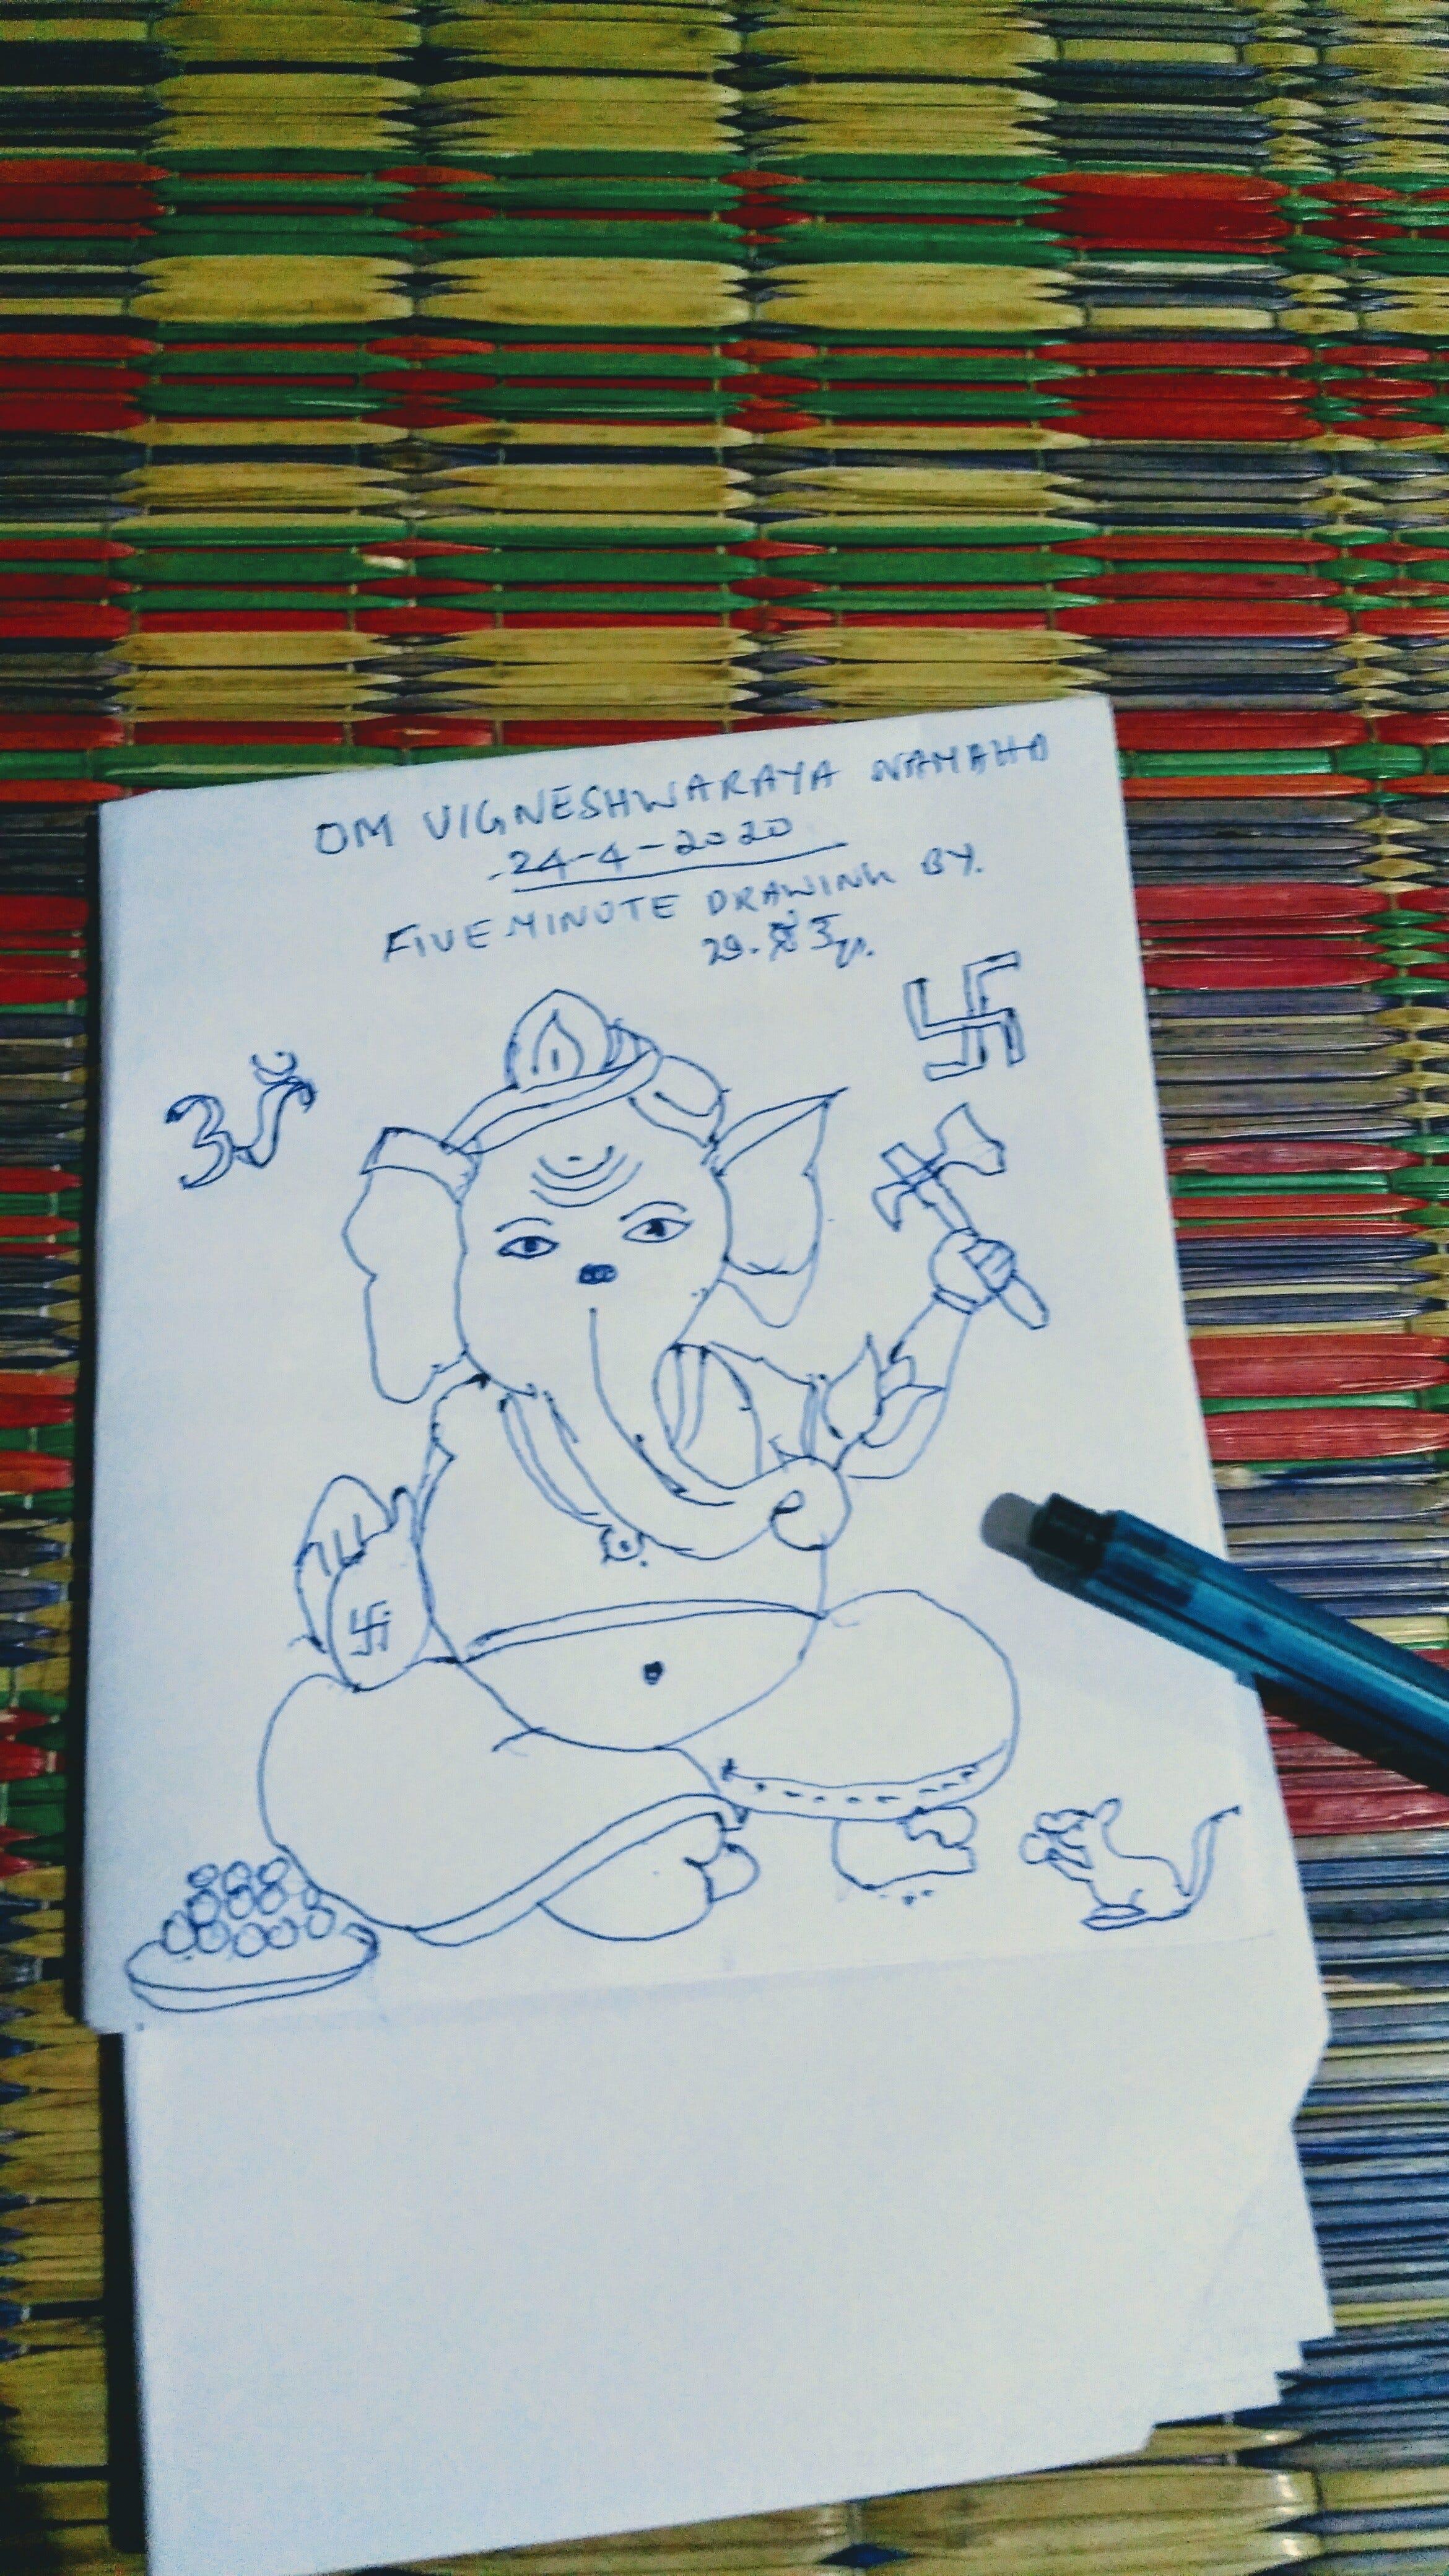 Lord Ganesha Drawing In Five Minutes By Yogish Sathya Medium